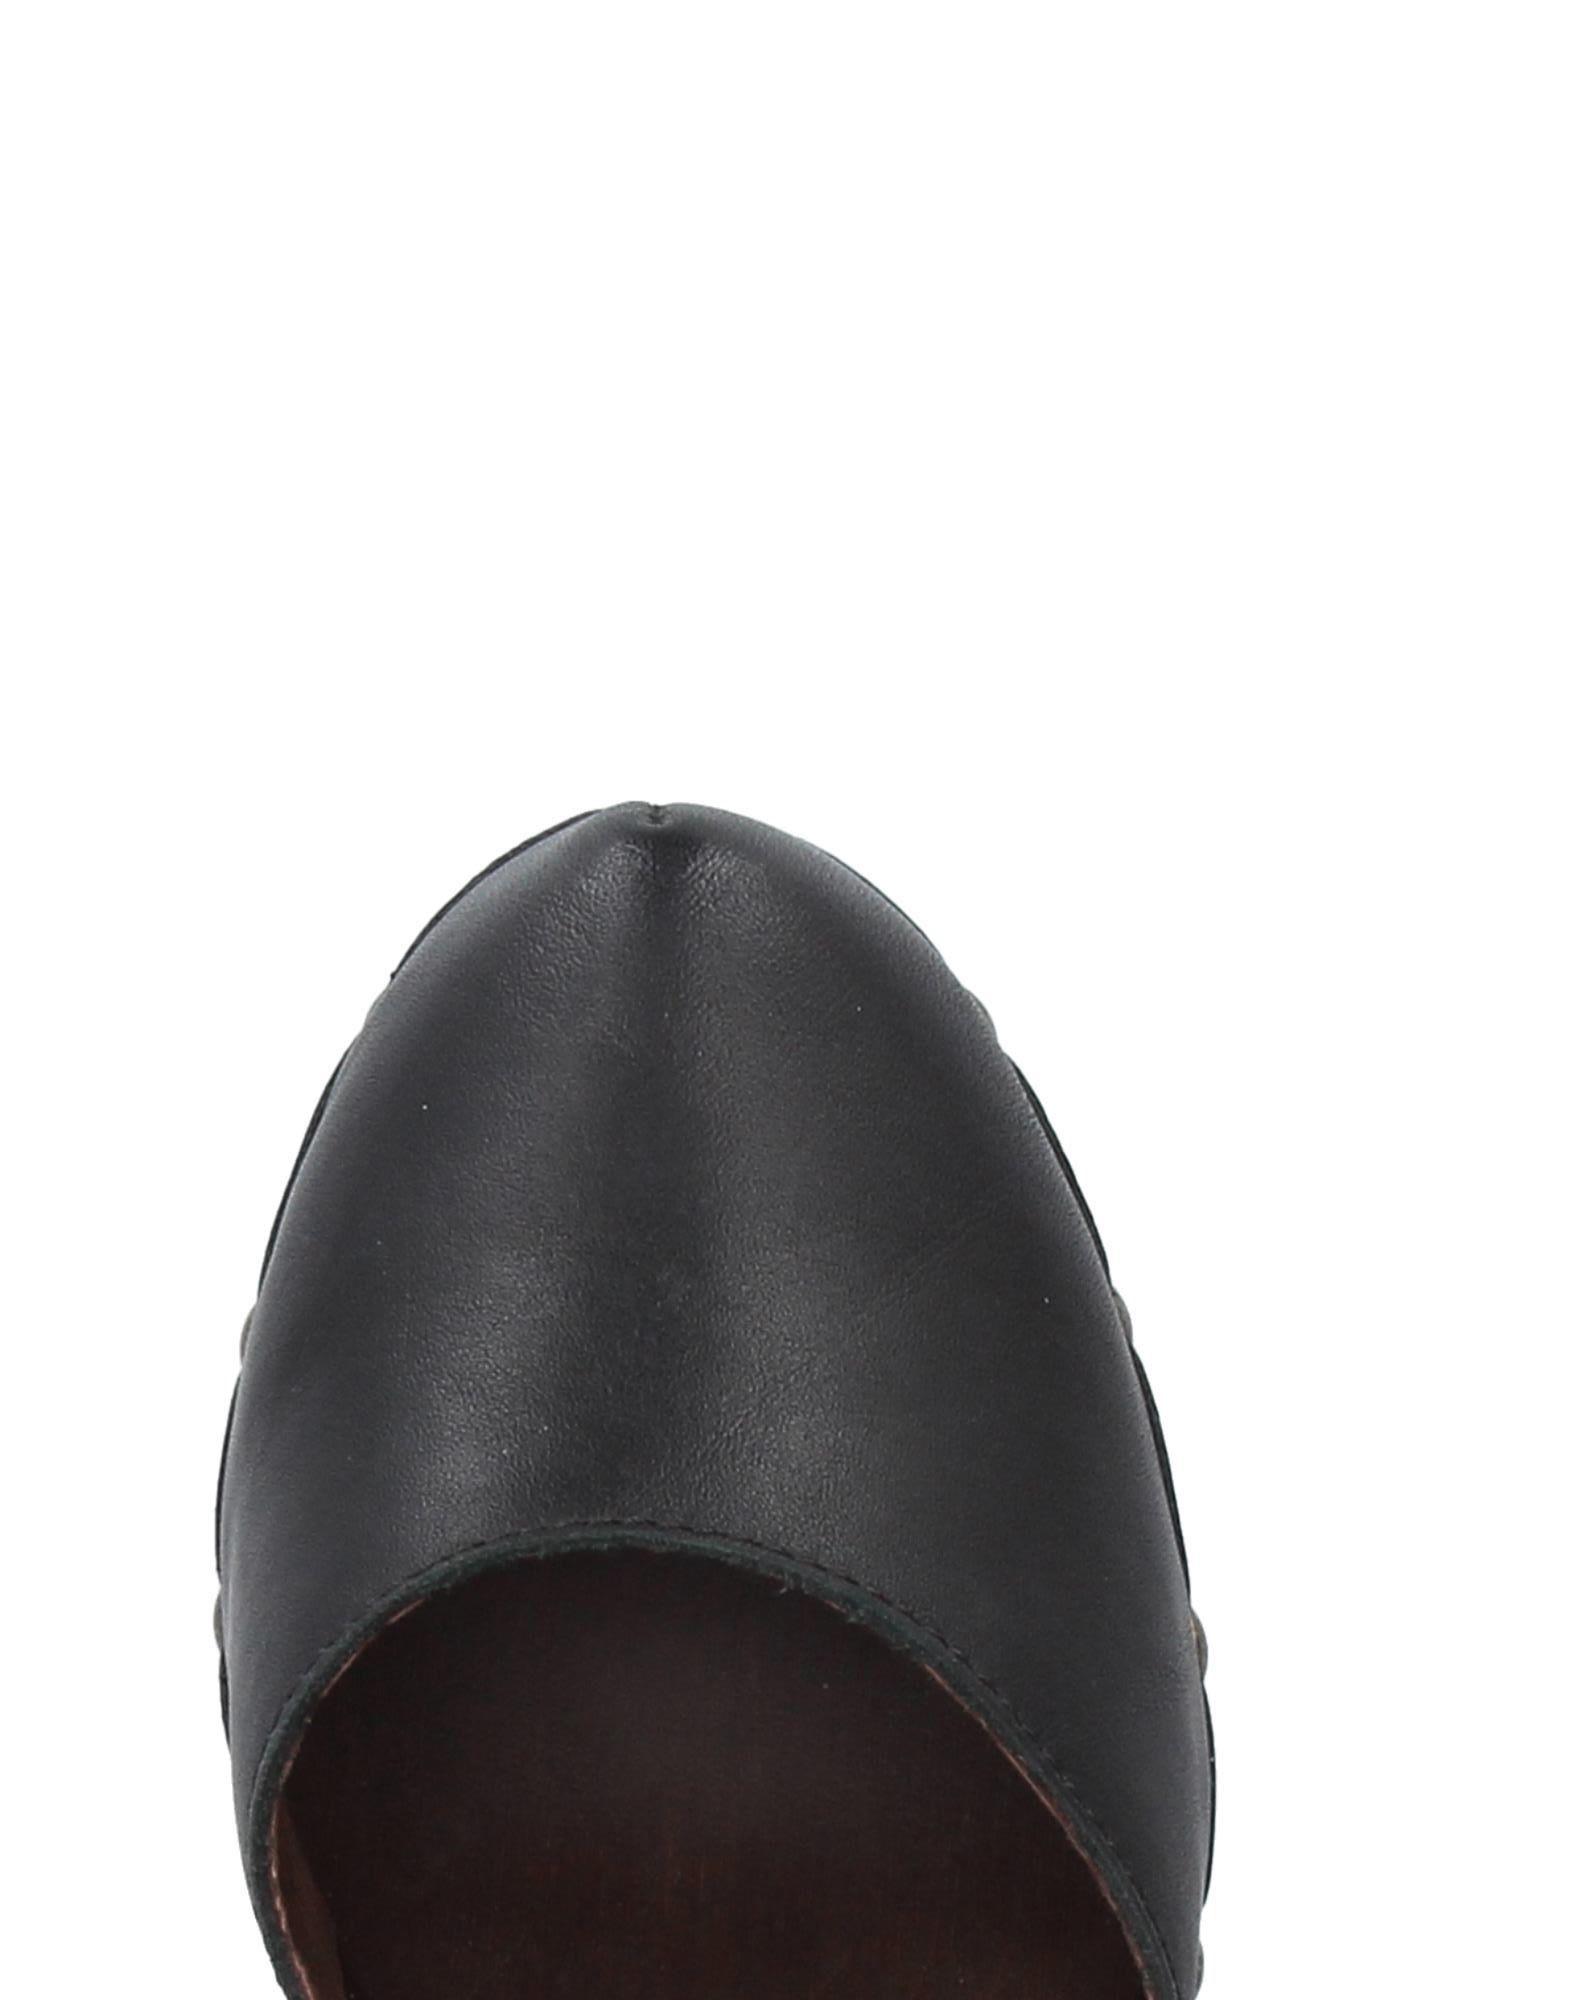 Argilla Pumps Damen  11382135JX Gute Gute Gute Qualität beliebte Schuhe fc9c94